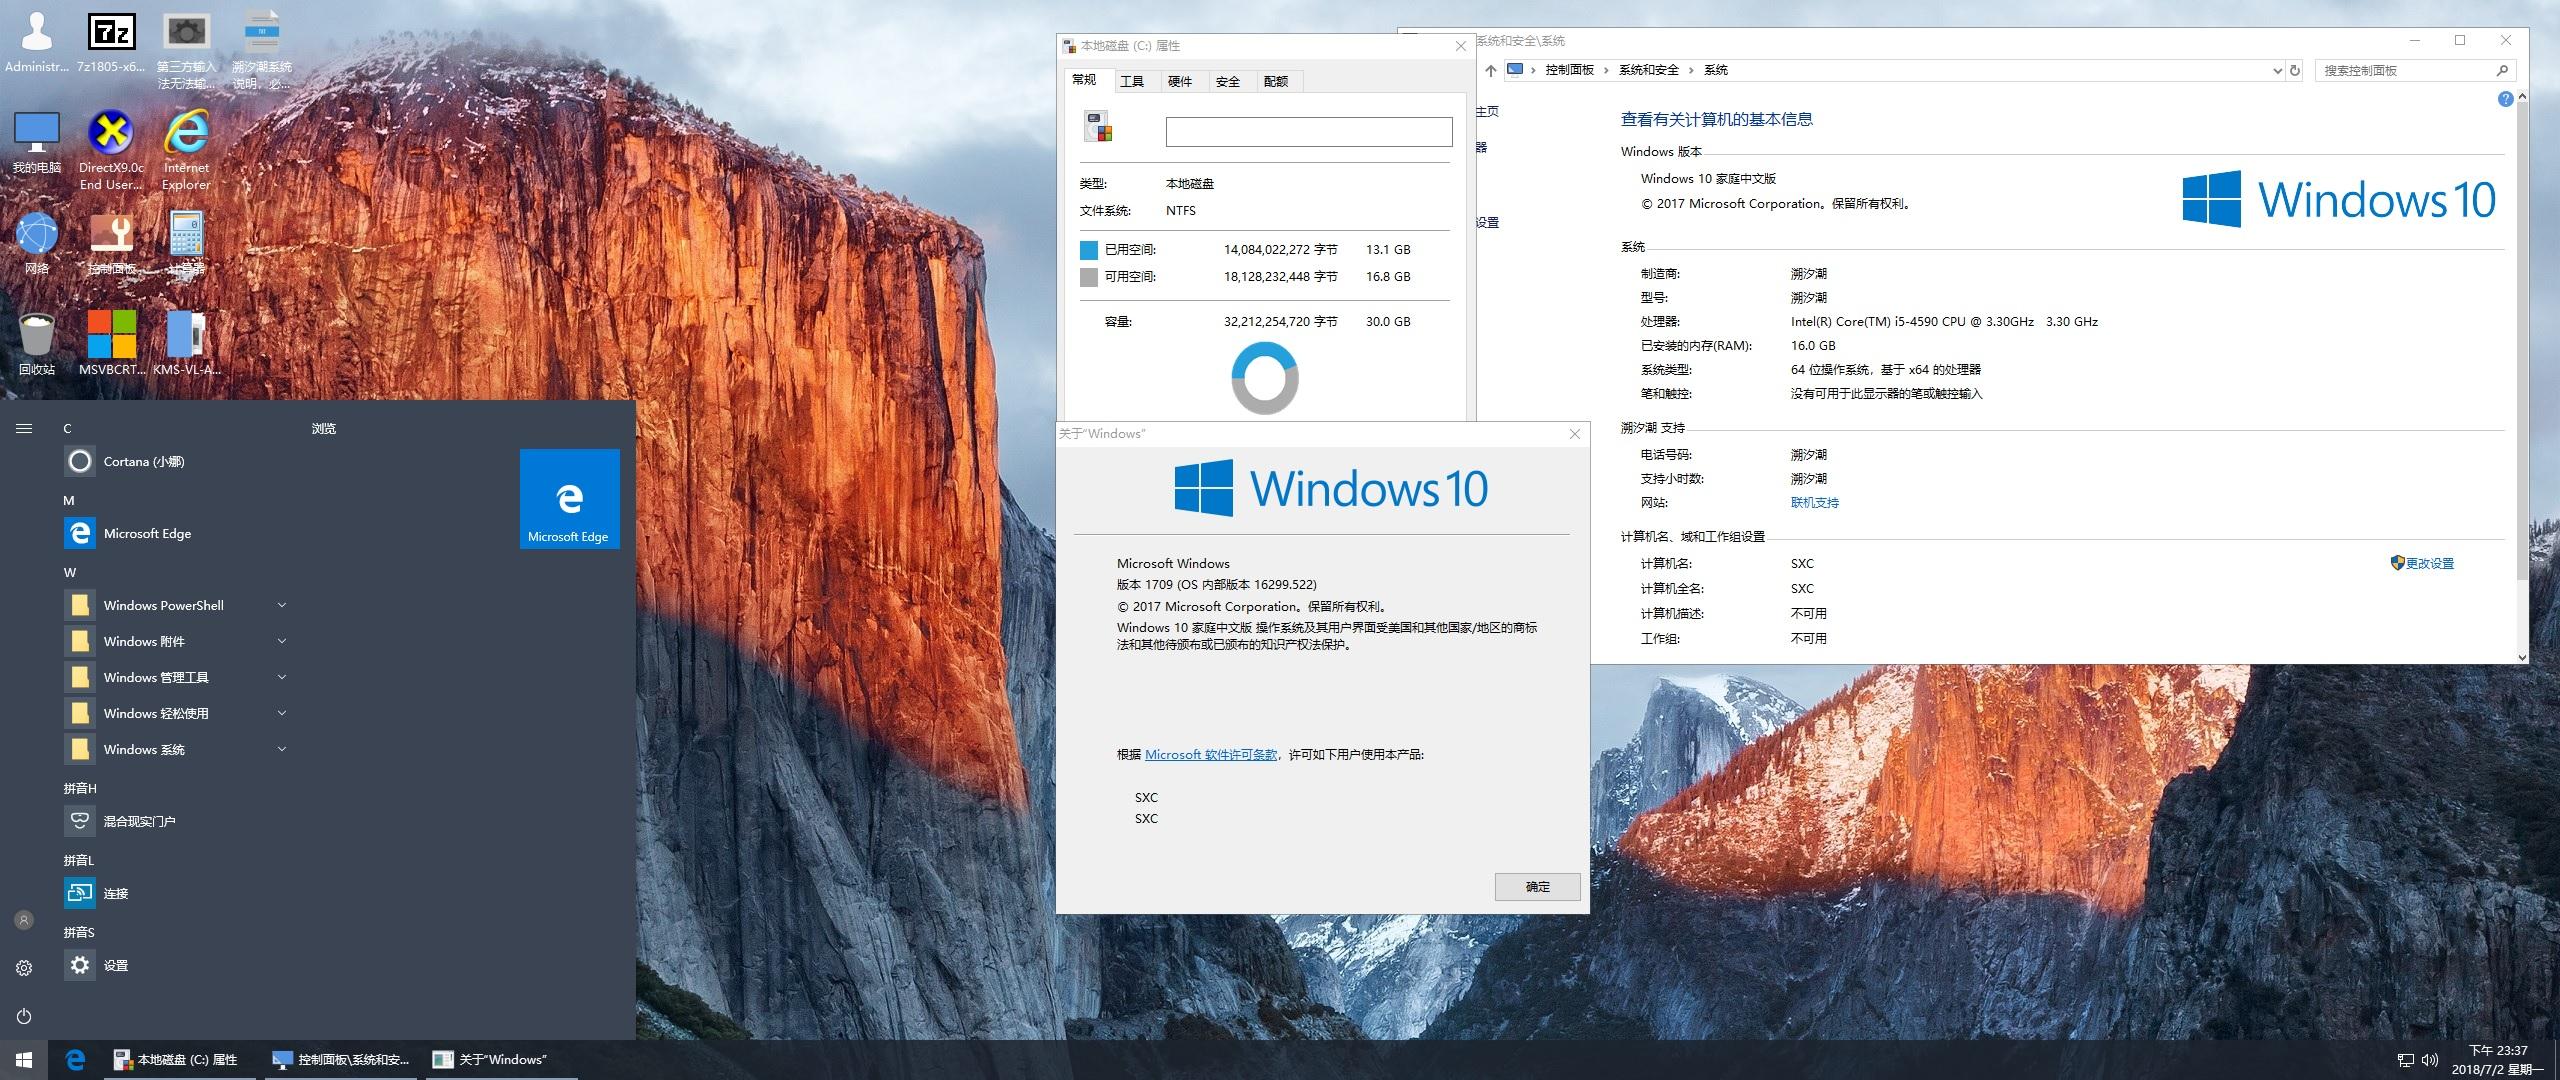 5bb2ecb020e26 【溯汐潮】Windows 10 Rs3 1709 16299 x64 家庭中文 完整版 不精简只优化